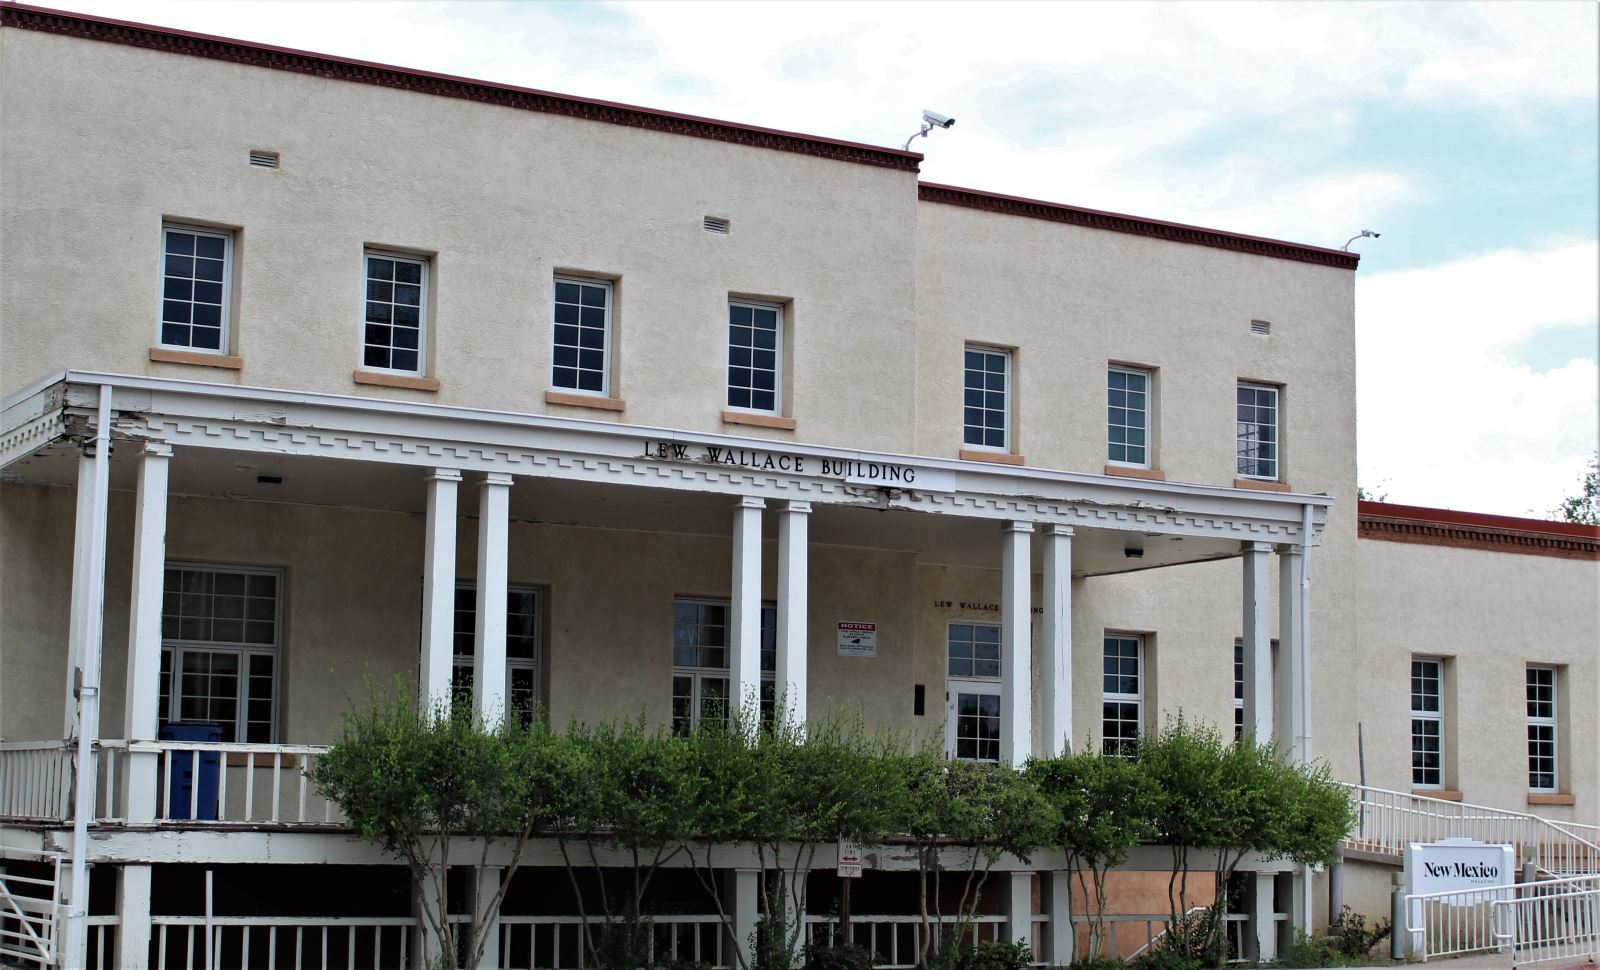 Lew Wallace Building